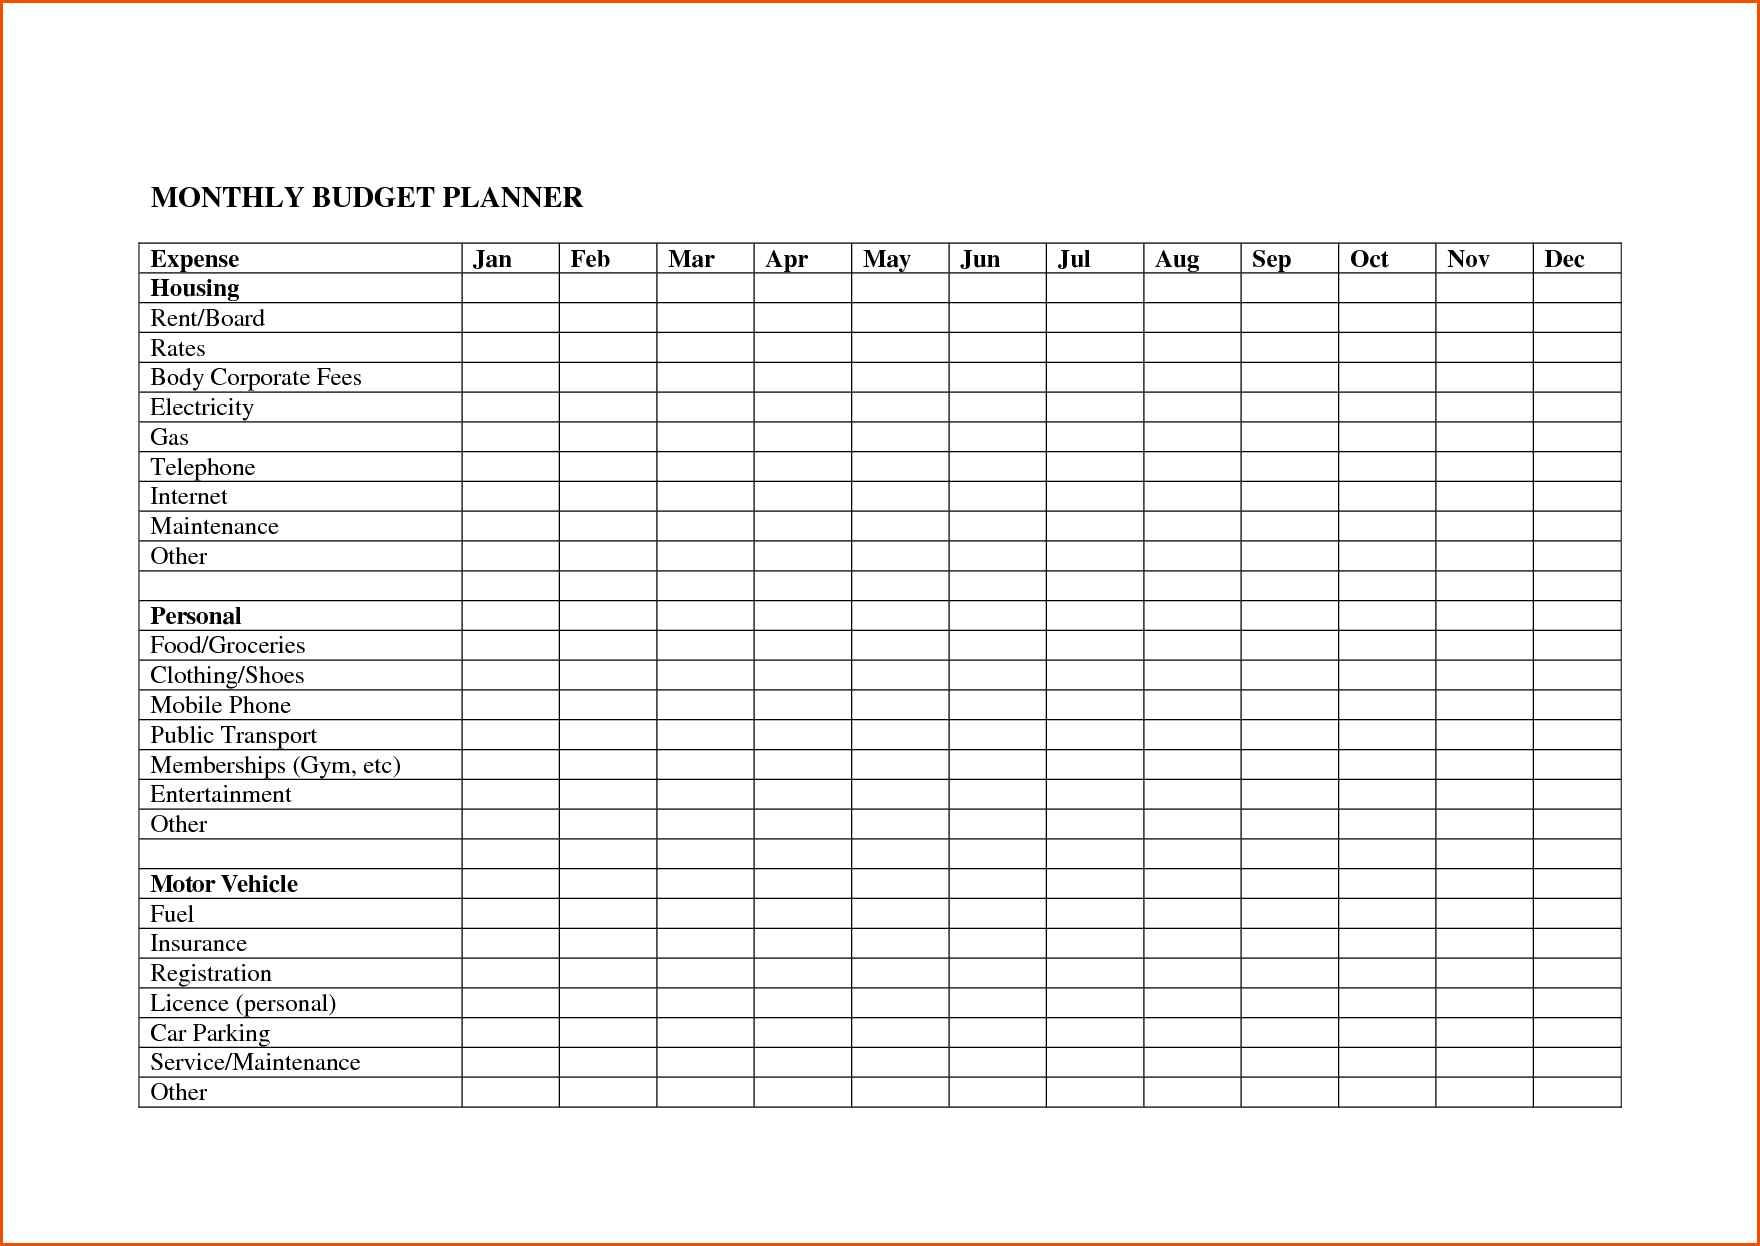 Bill Spreadsheet 2018 Excel Spreadsheet Templates Free Online And Excel Spreadsheet Templates Free